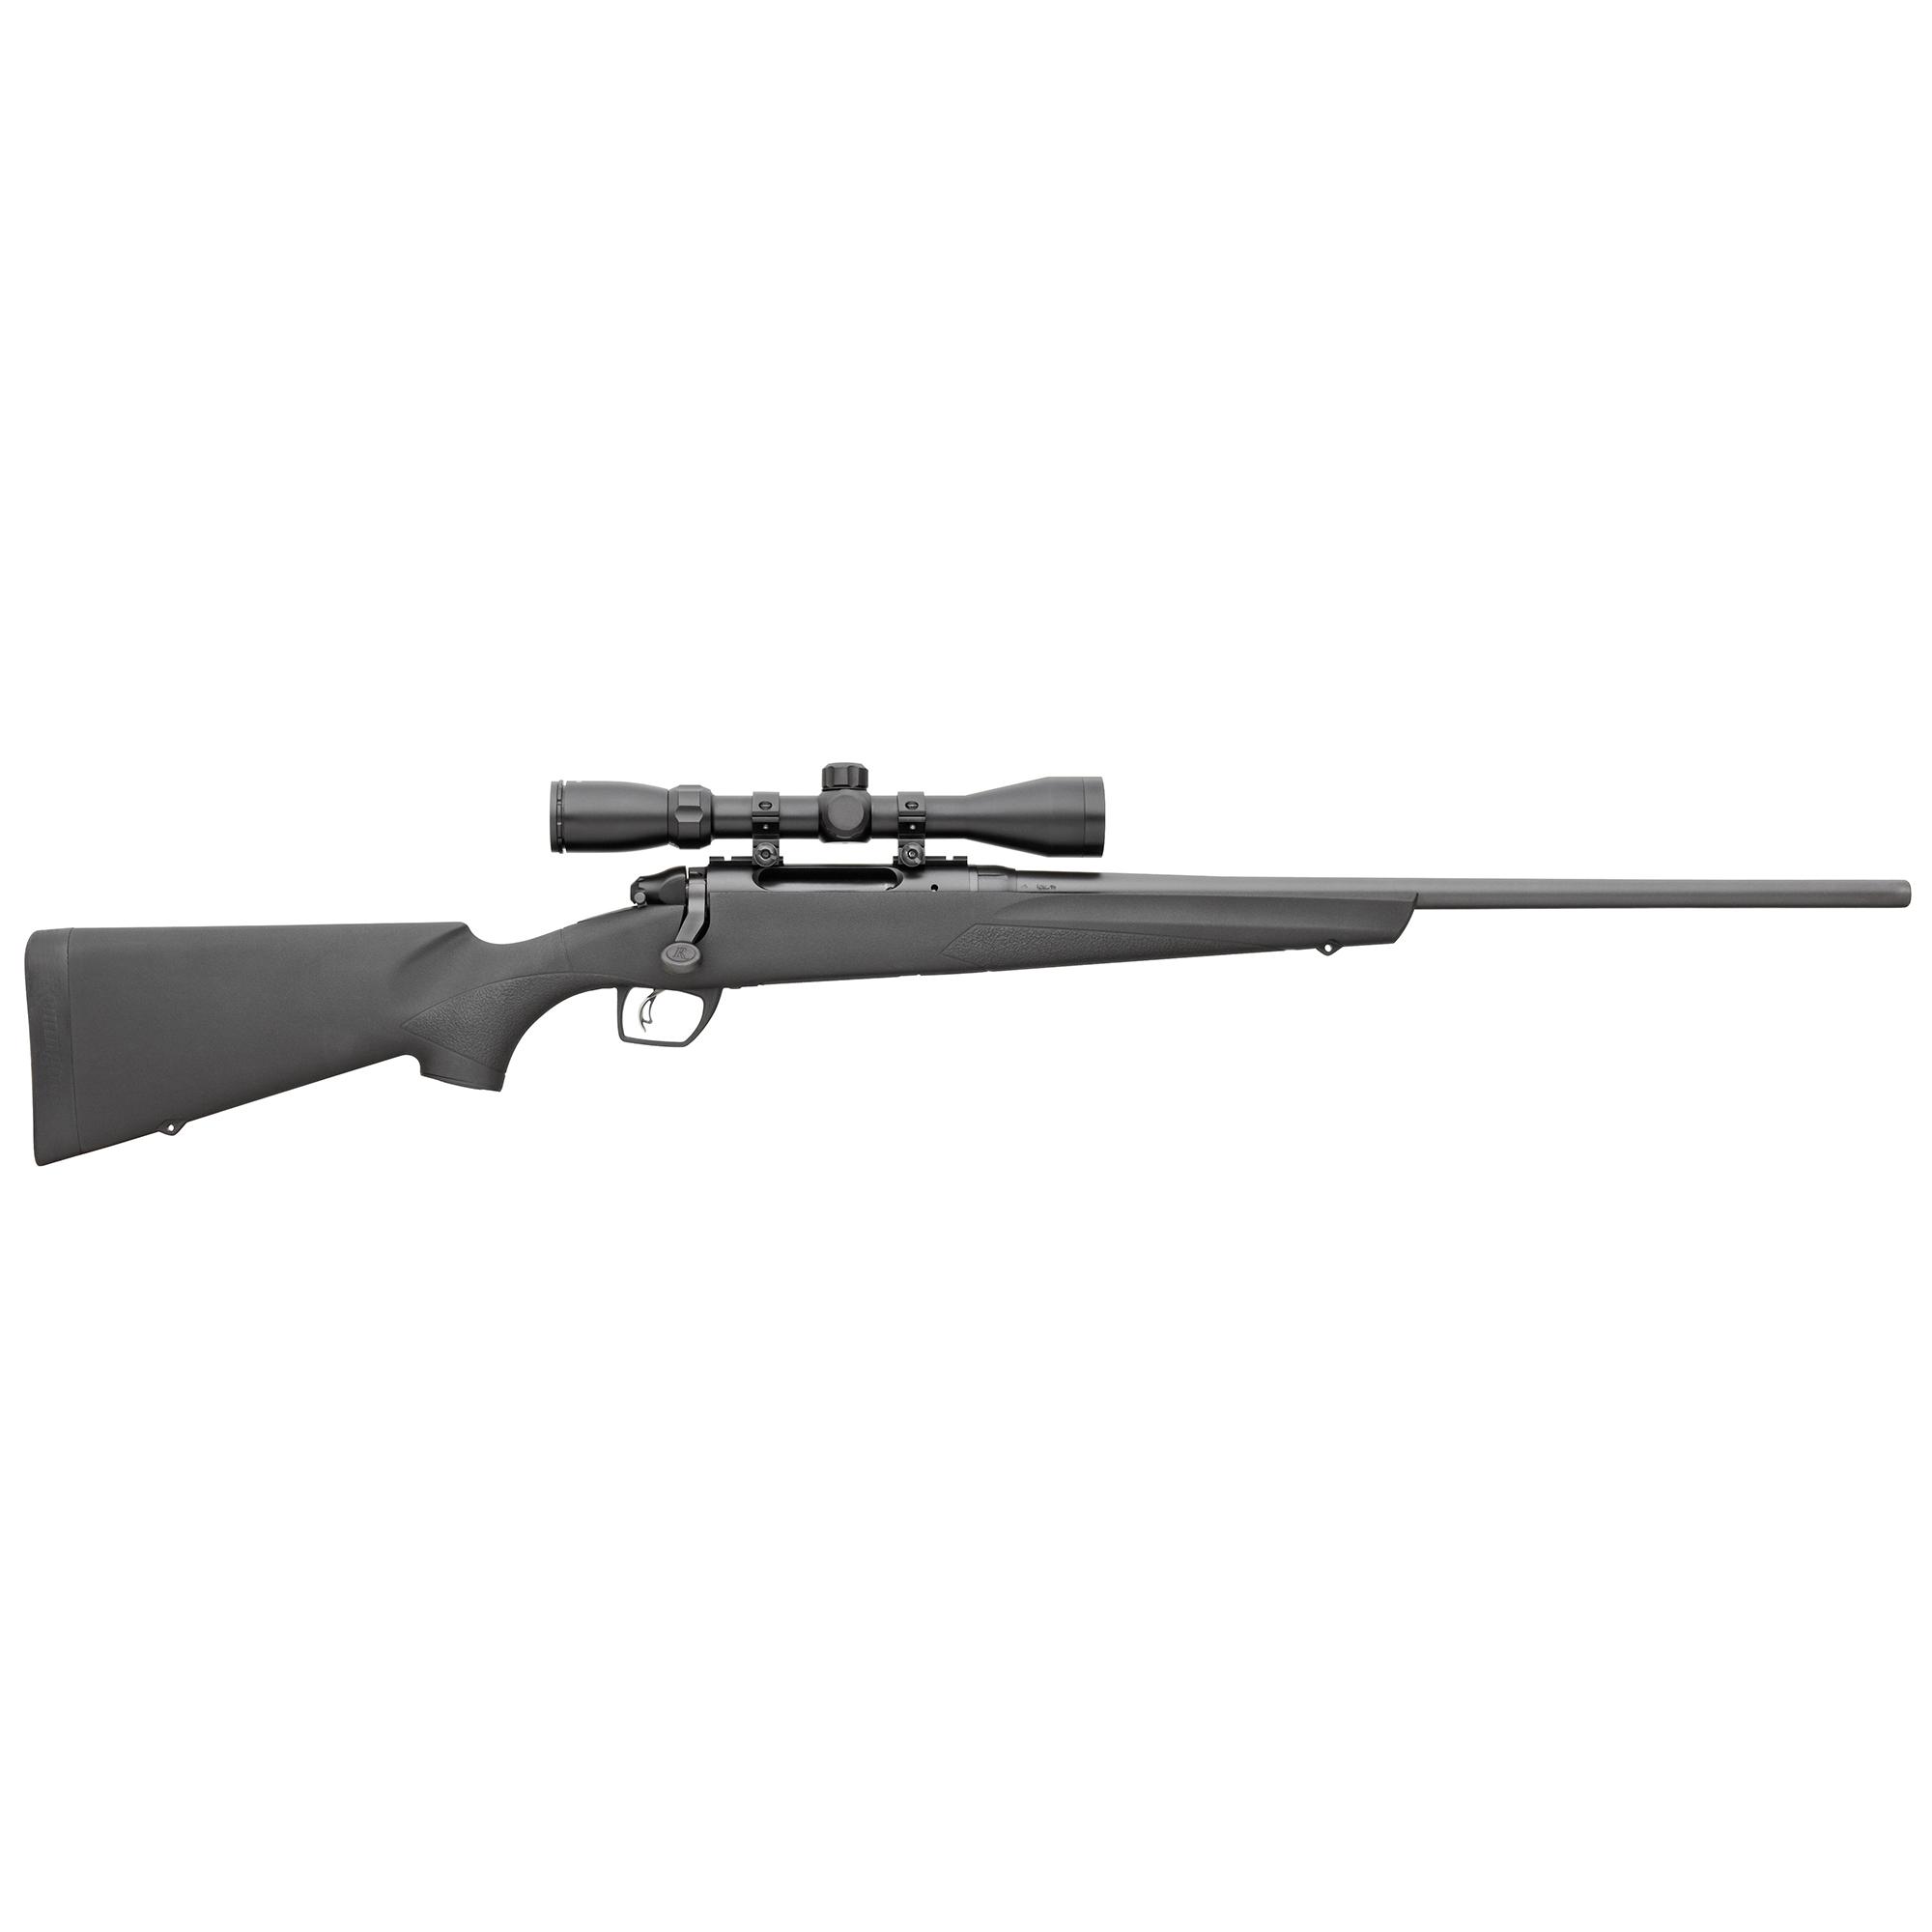 Remington Model 783 Centerfire Rifle Package